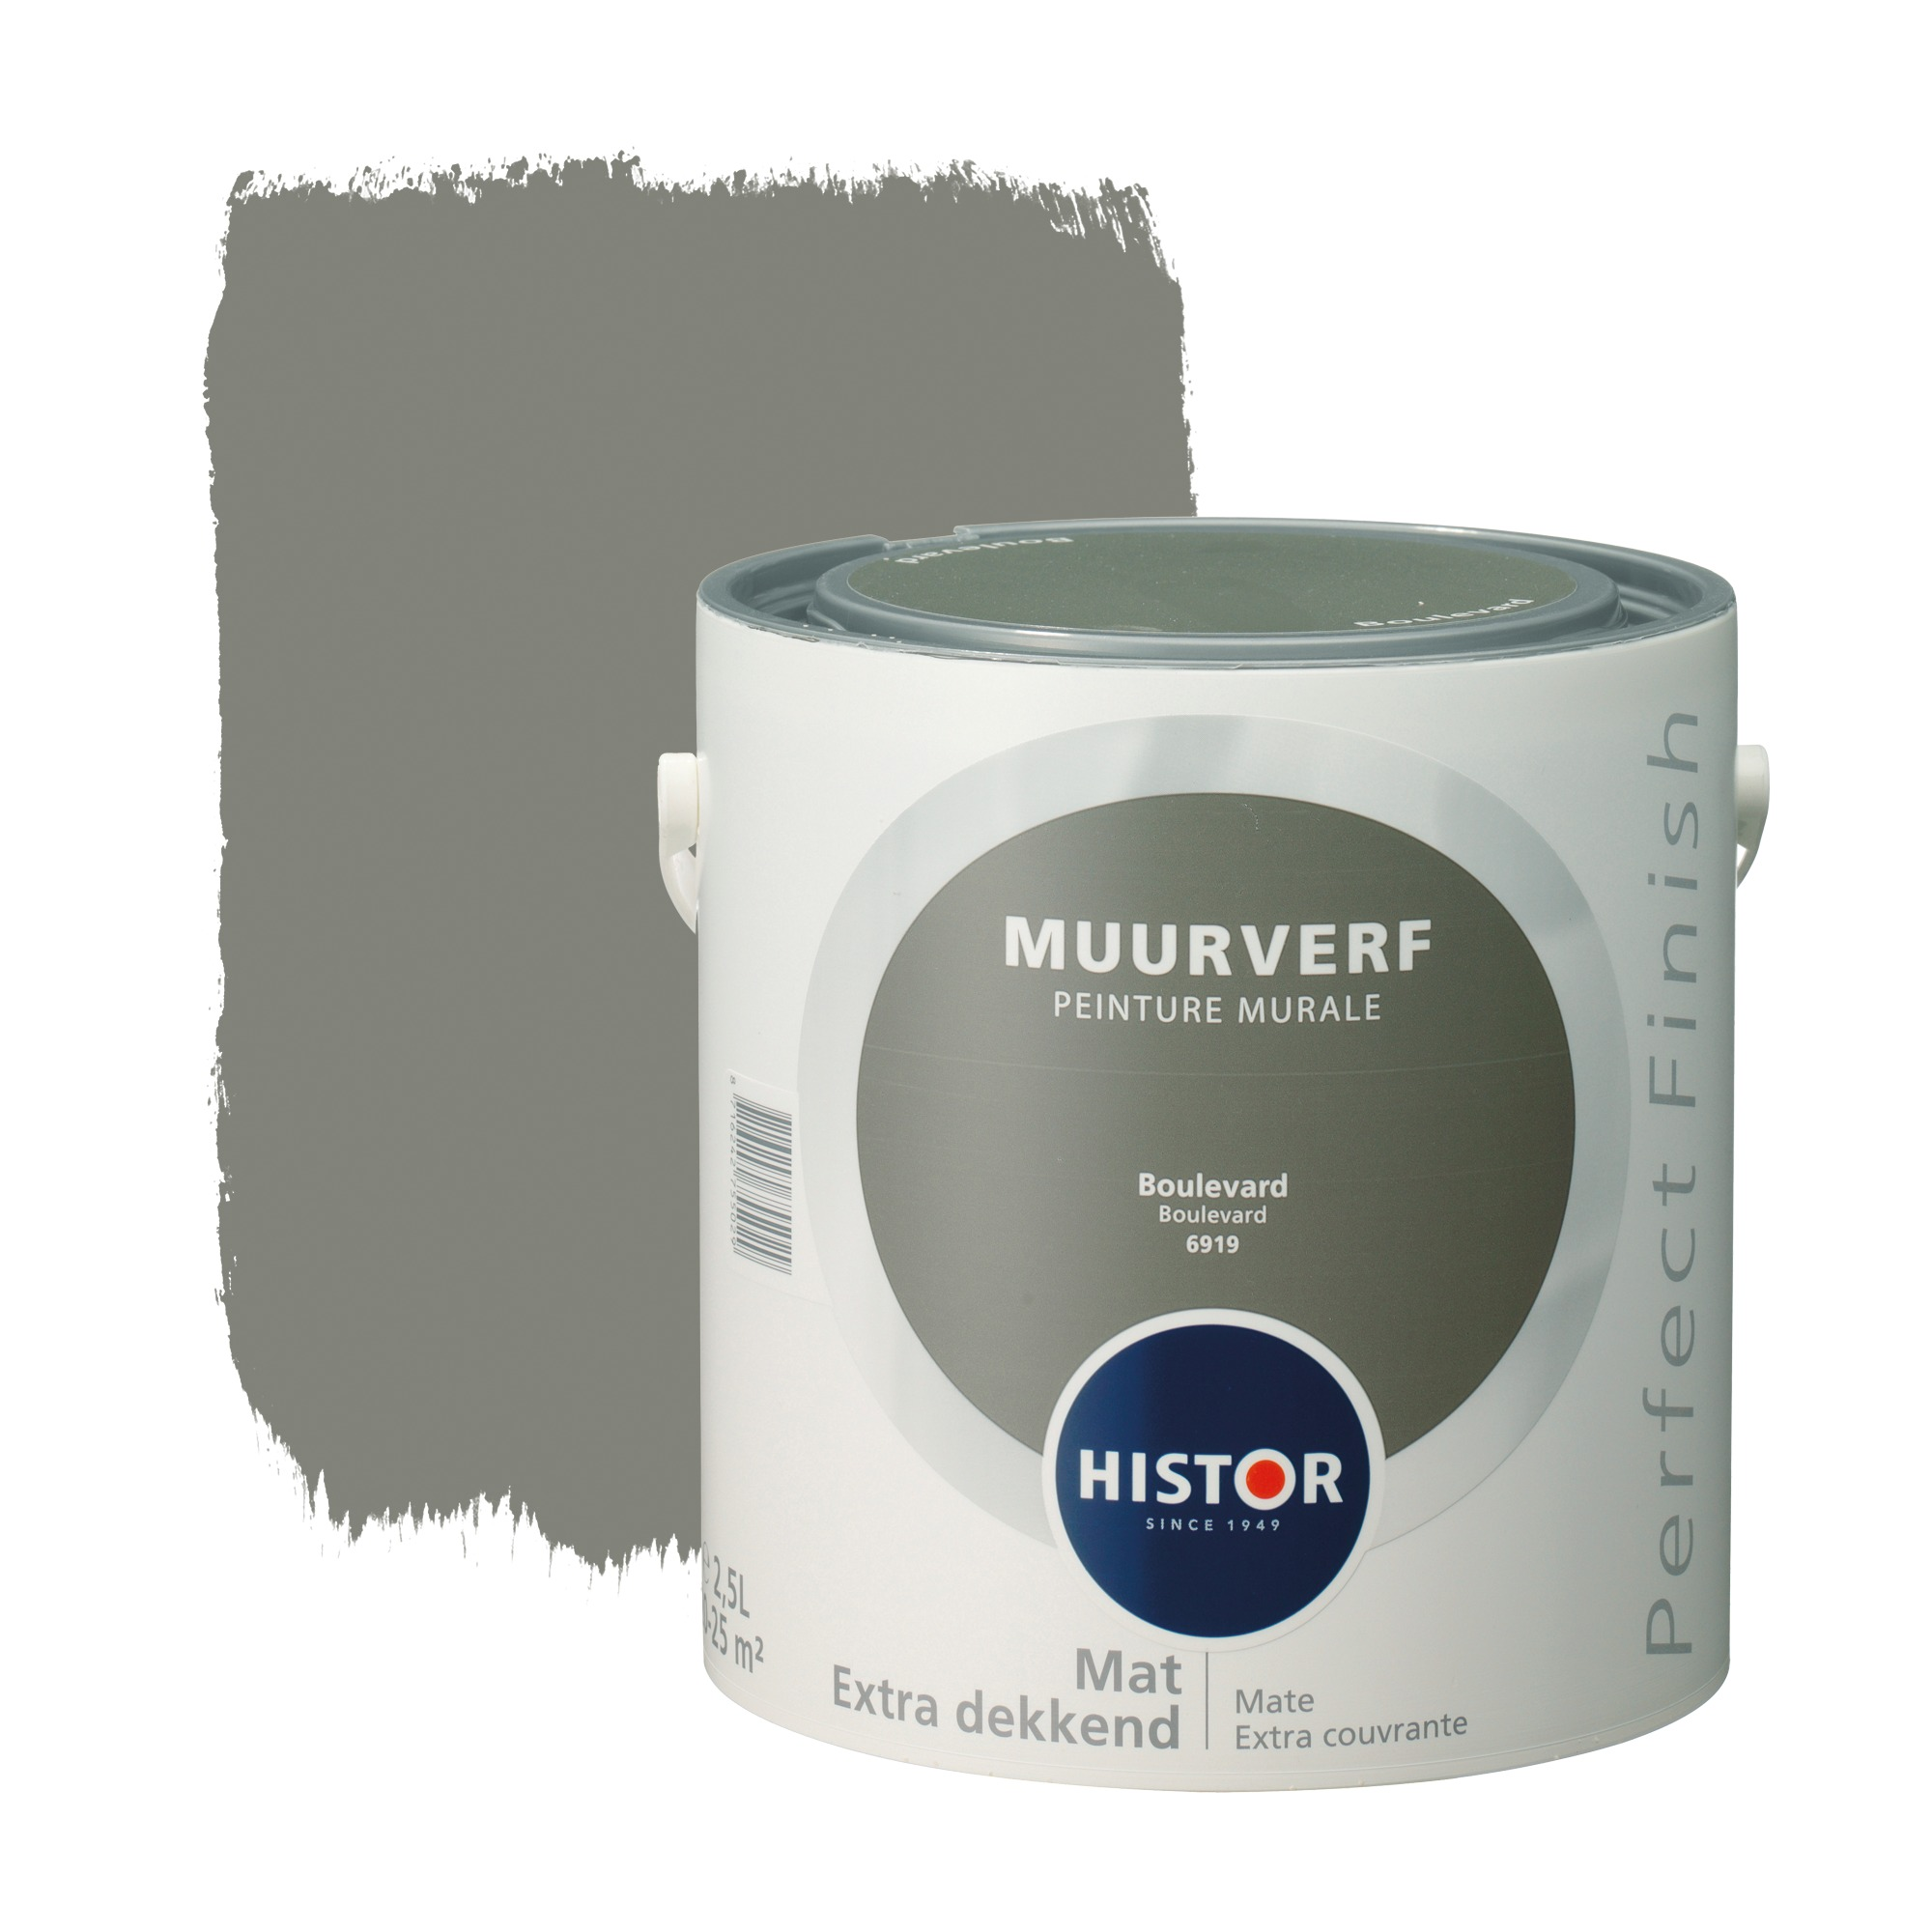 Histor perfect finish muurverf mat boulevard 6919 2,5 l